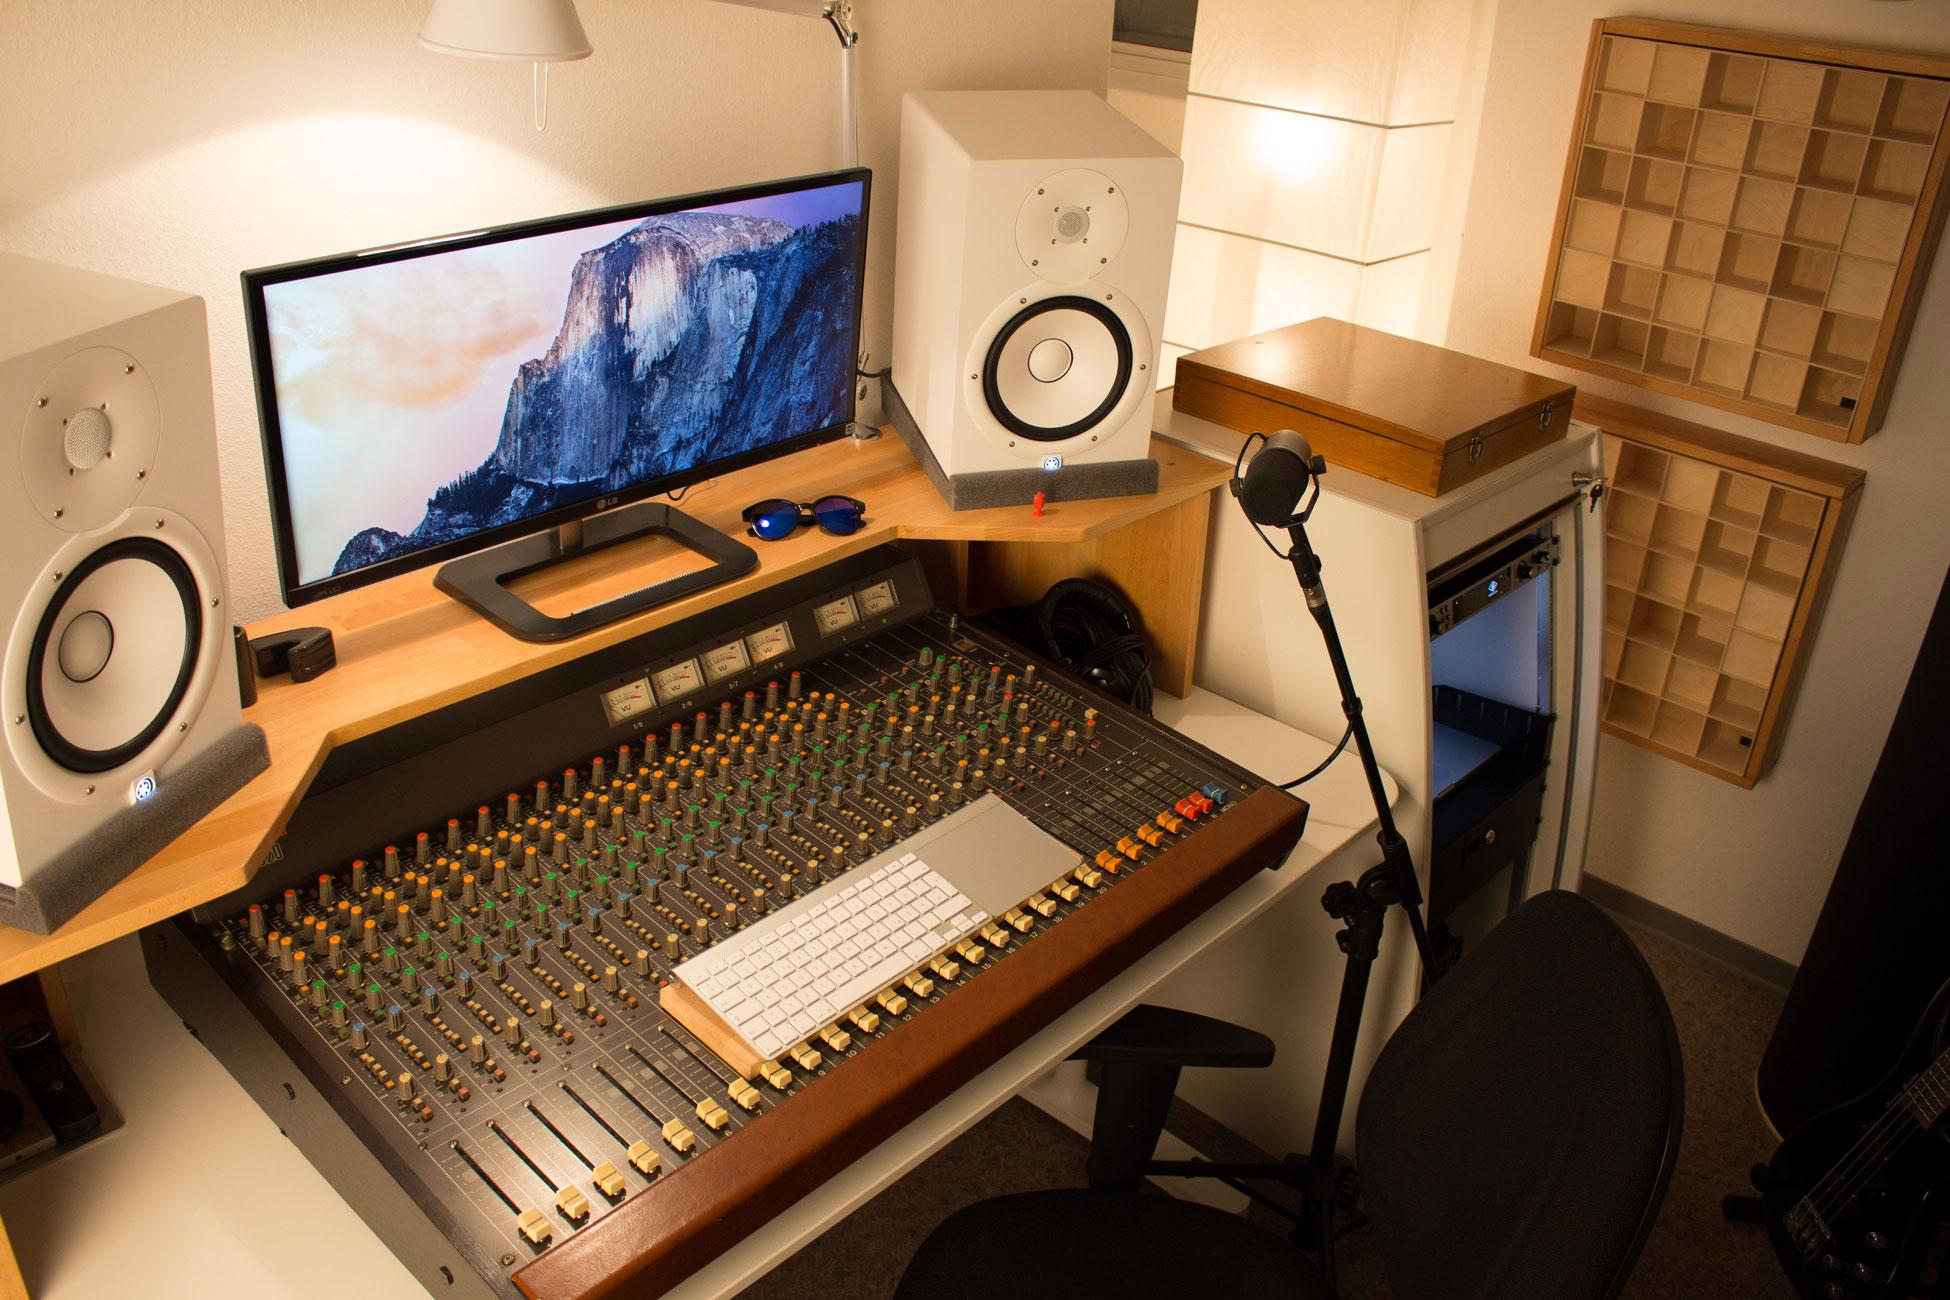 Tonstudio33 - Musikproduktion Mixing Mastering